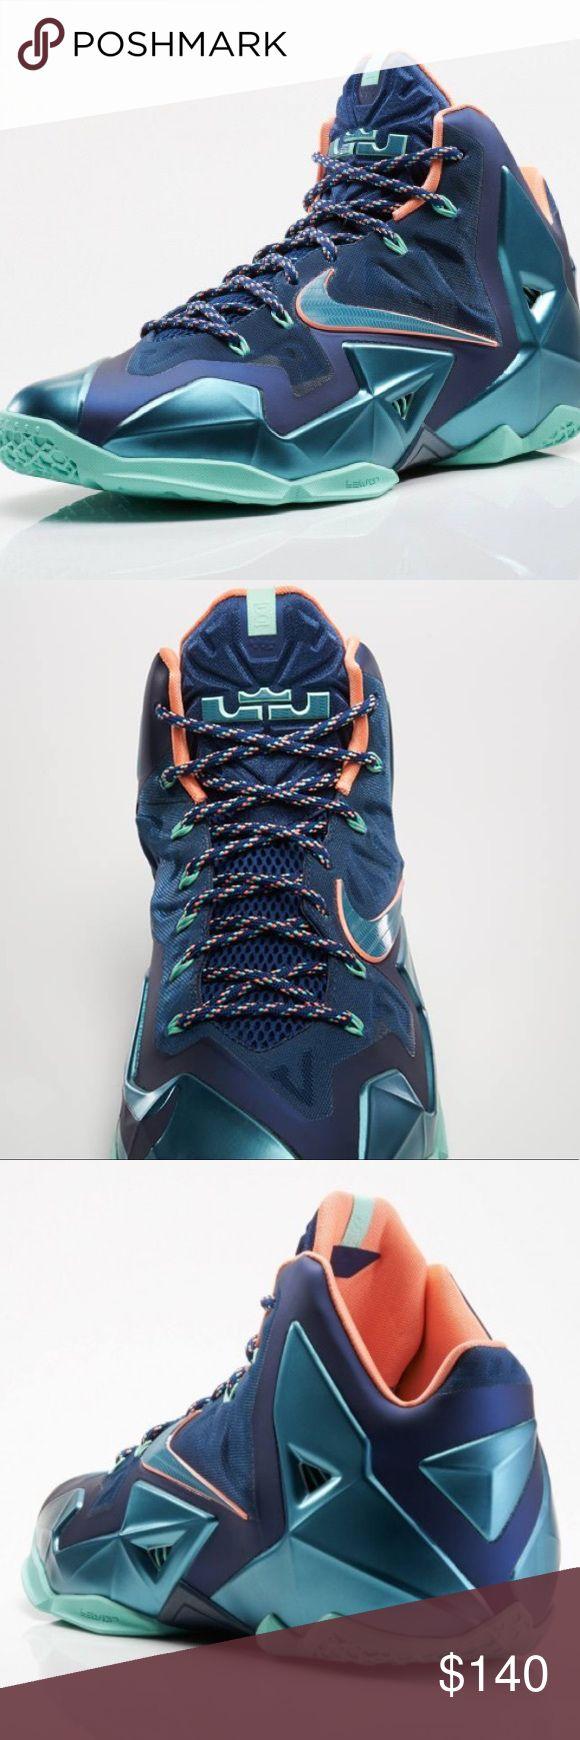 "Men's Nike LeBron 11 ""Akron Vs Miami Men's Nike LeBron 11 ""Akron Vs Miami in nearly perfect condition. Size 13, no box. Awesome shoes Nike Shoes Sneakers"